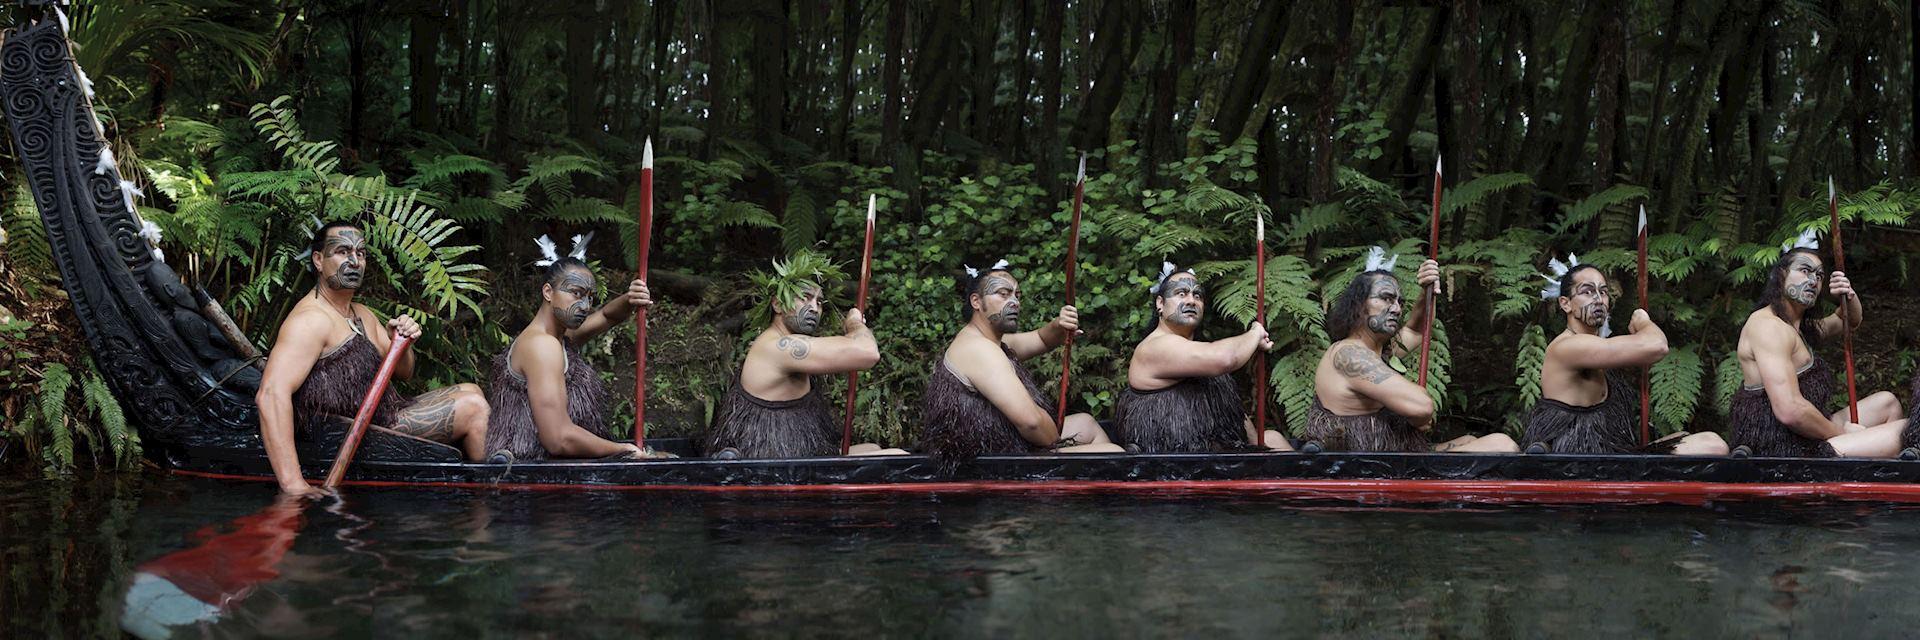 Maori cultural evening, Rotorua